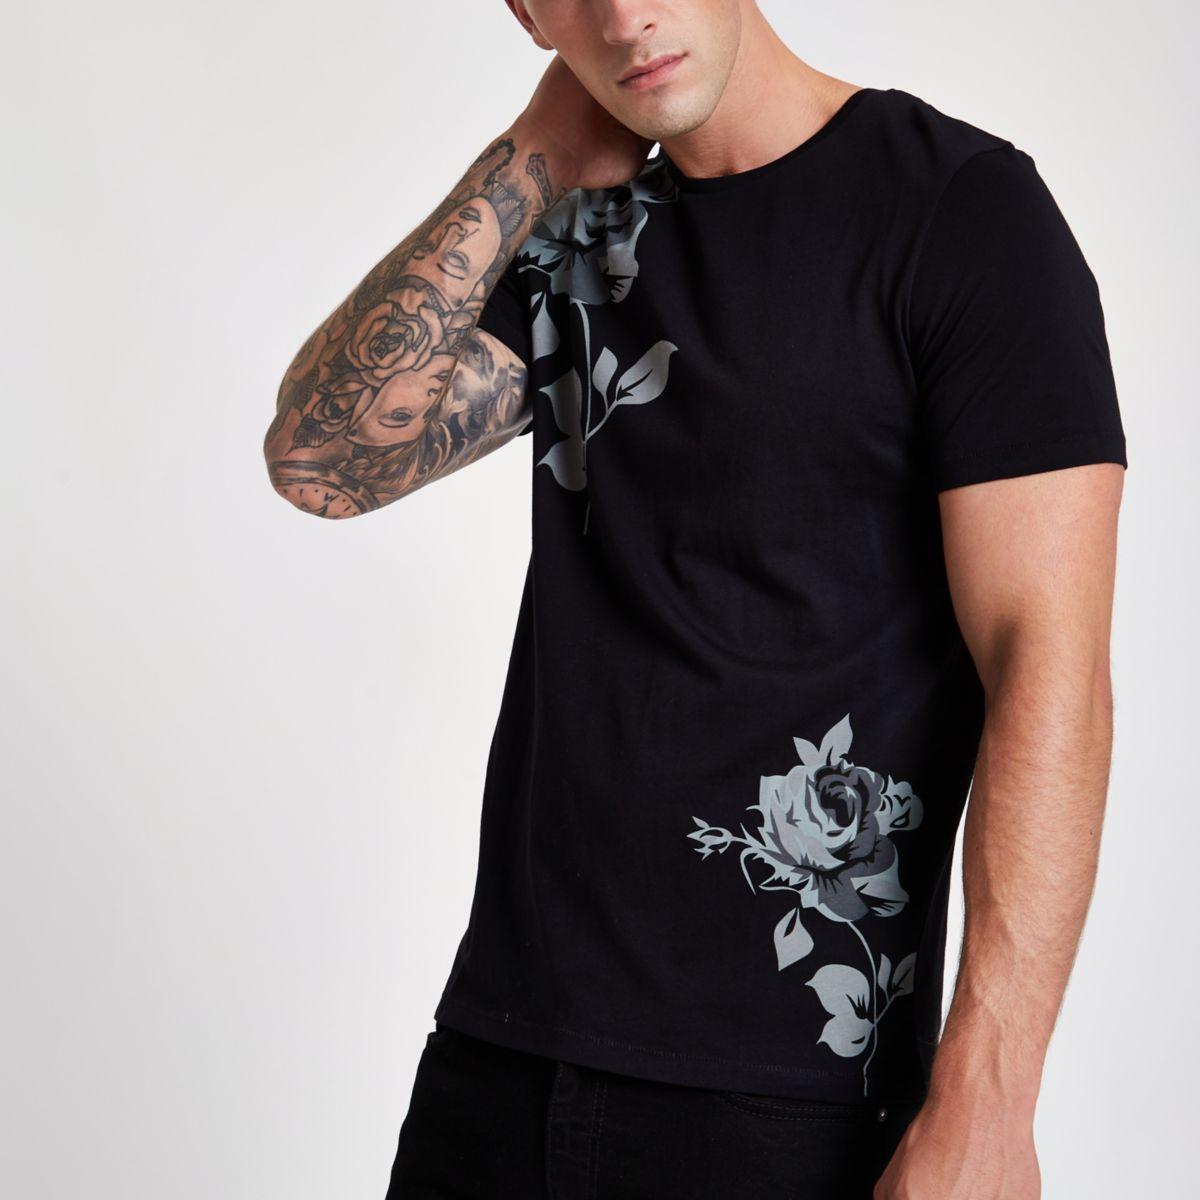 Jack & Jones Premium Black Rose Print T Shirt by River Island